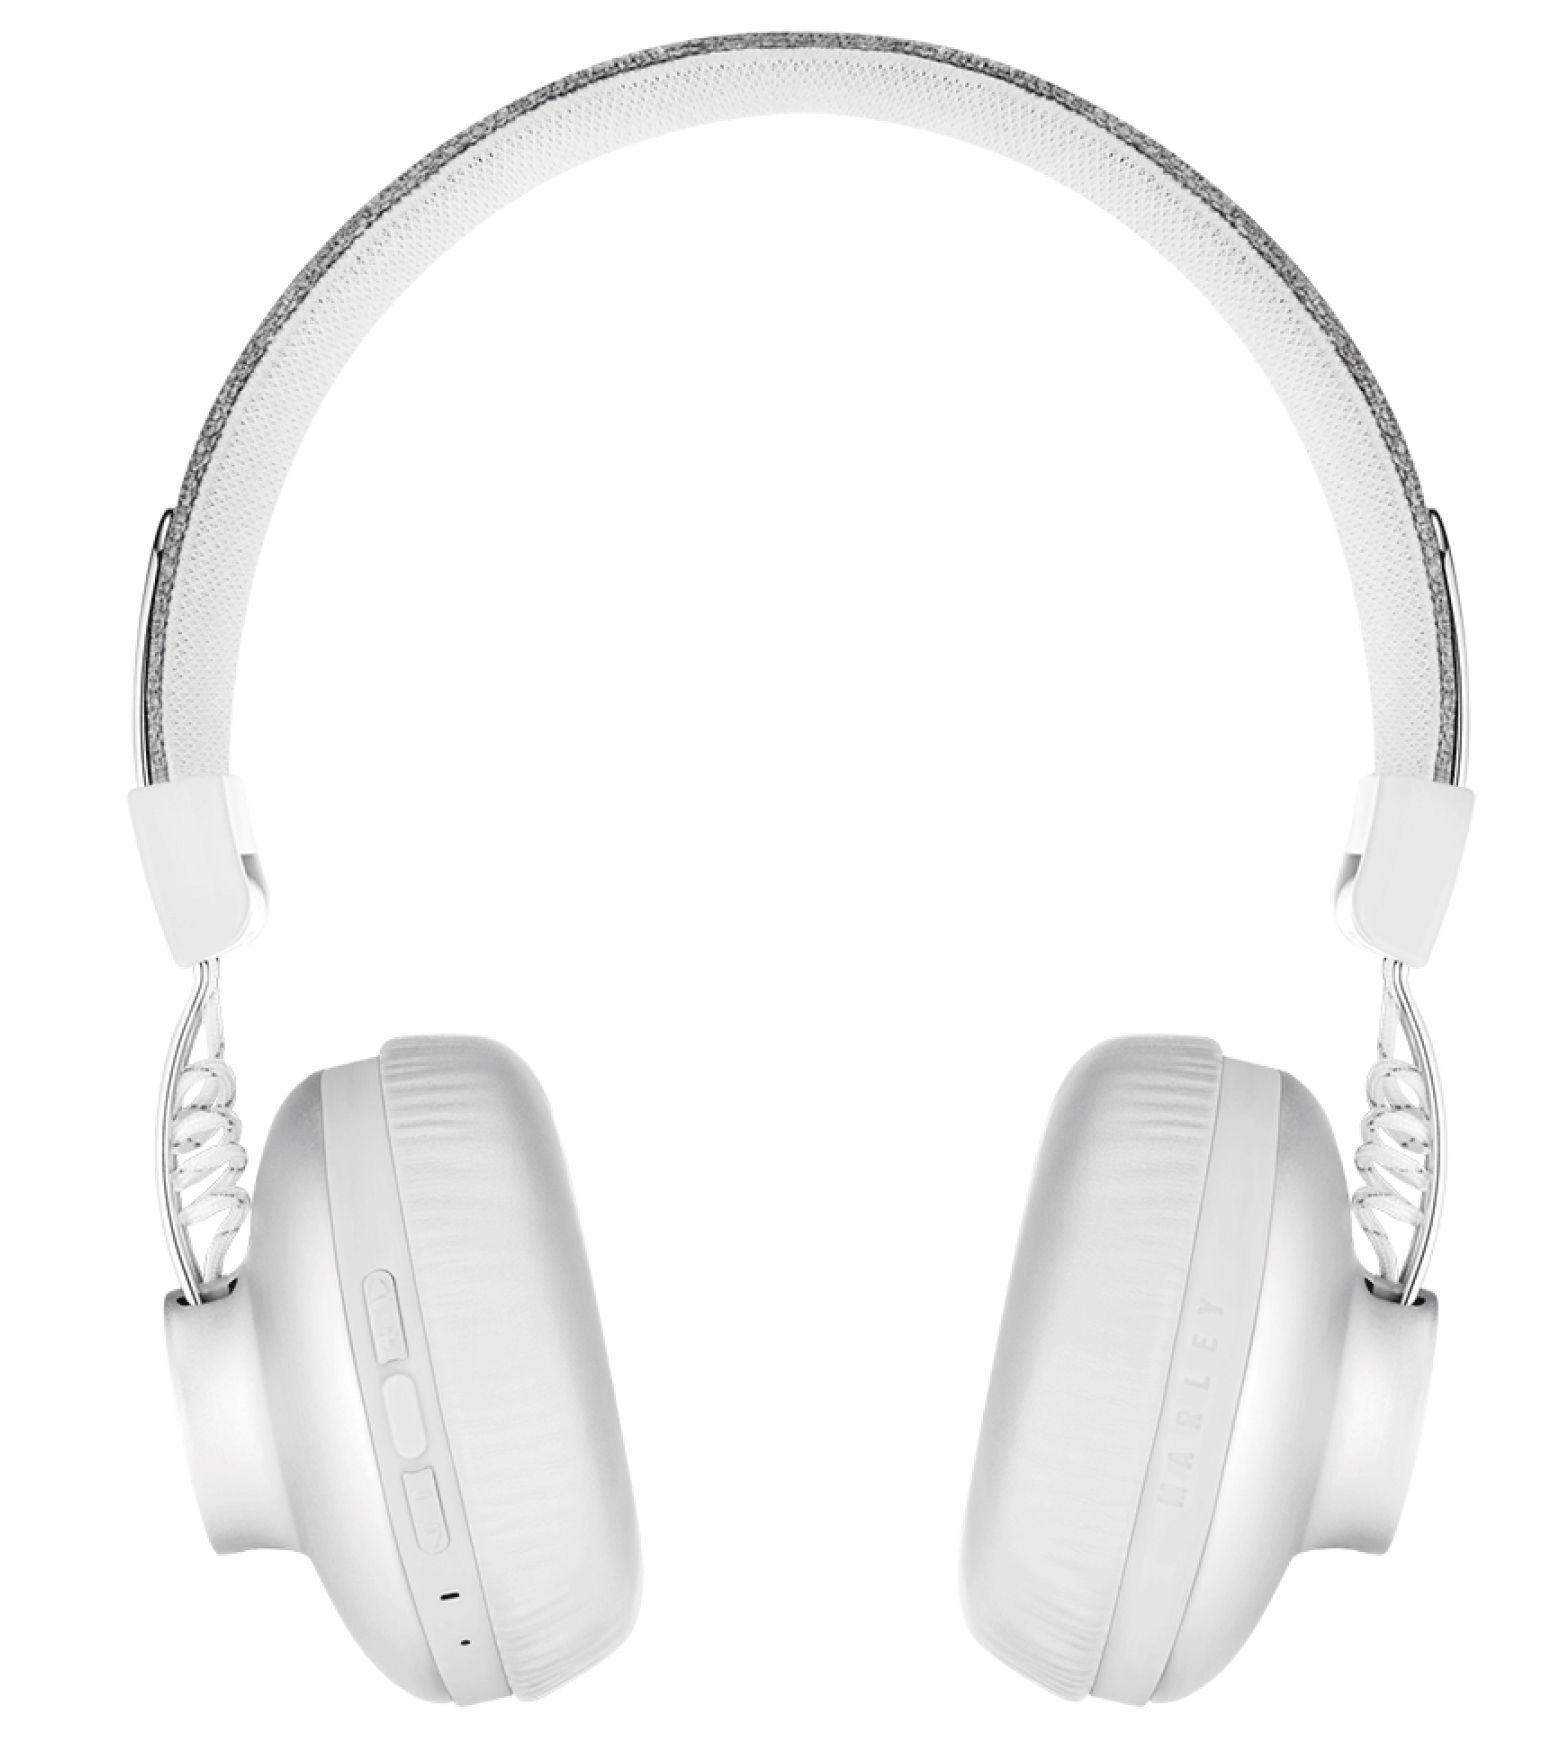 Безжични слушалки House of Marley - Positive Vibration 2, сребристи - 5